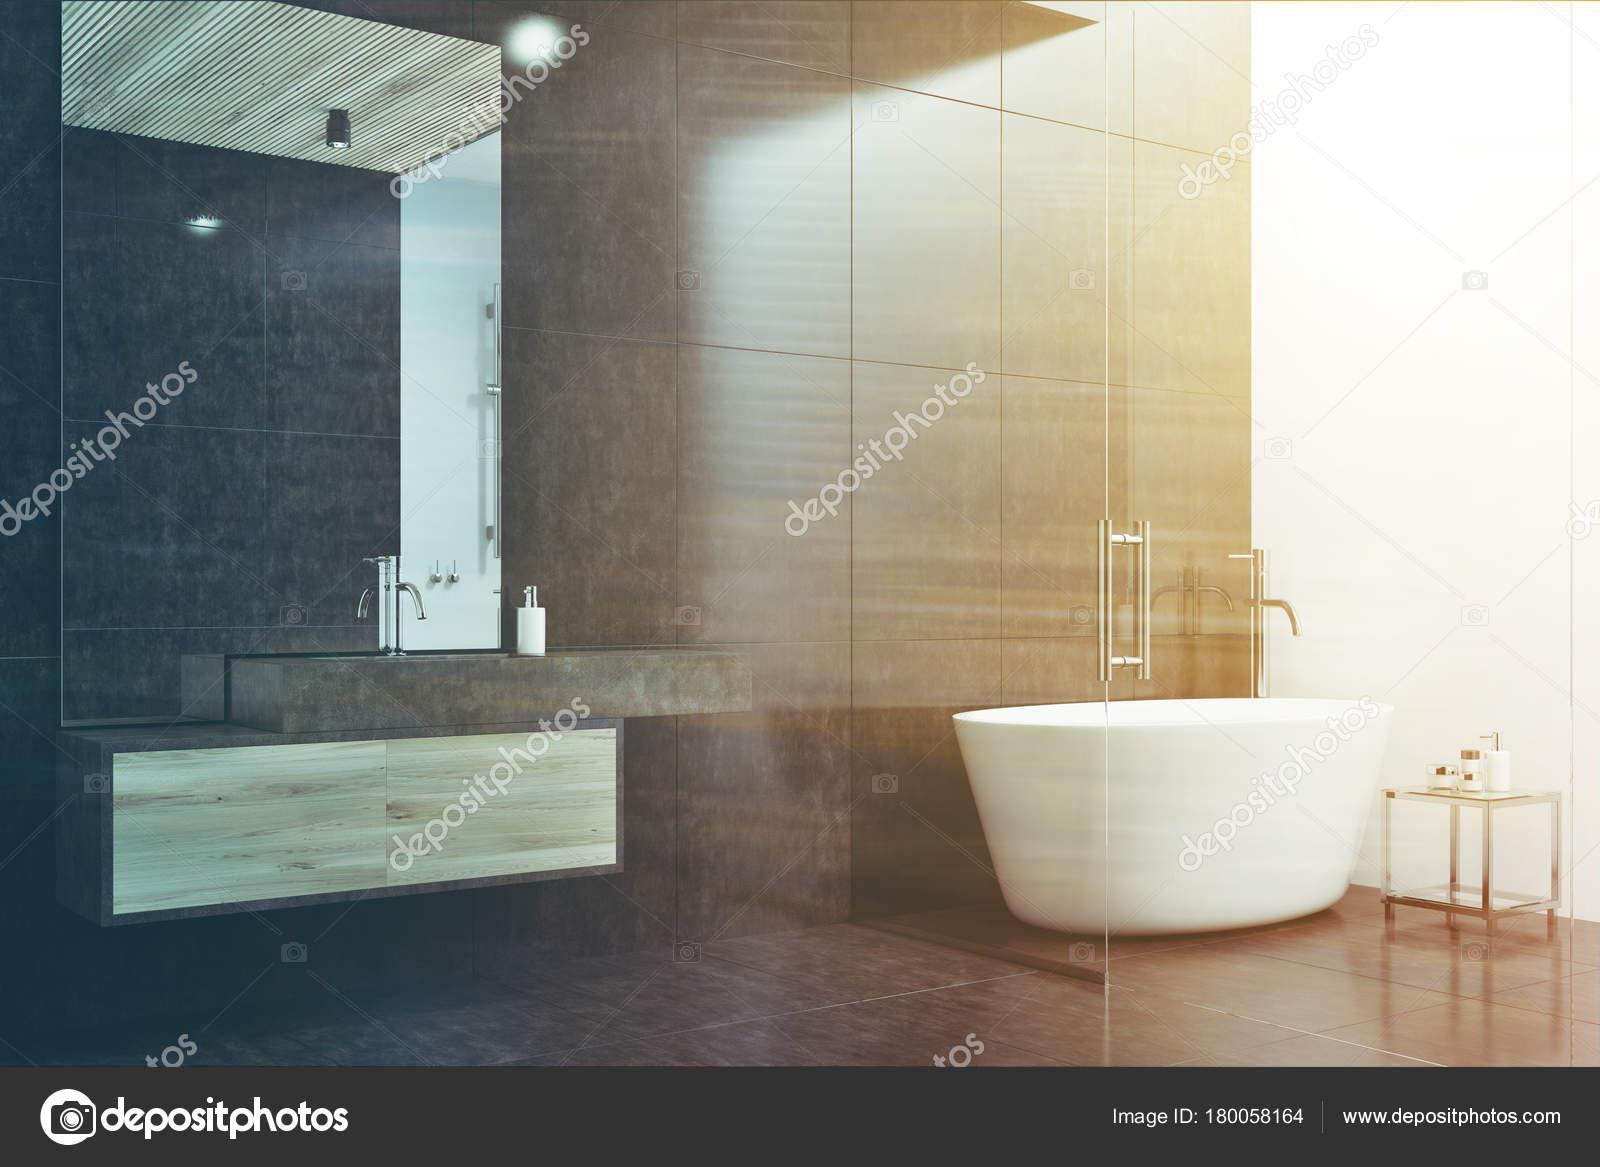 Zwart-wit badkamer hoek toned — Stockfoto © denisismagilov #180058164